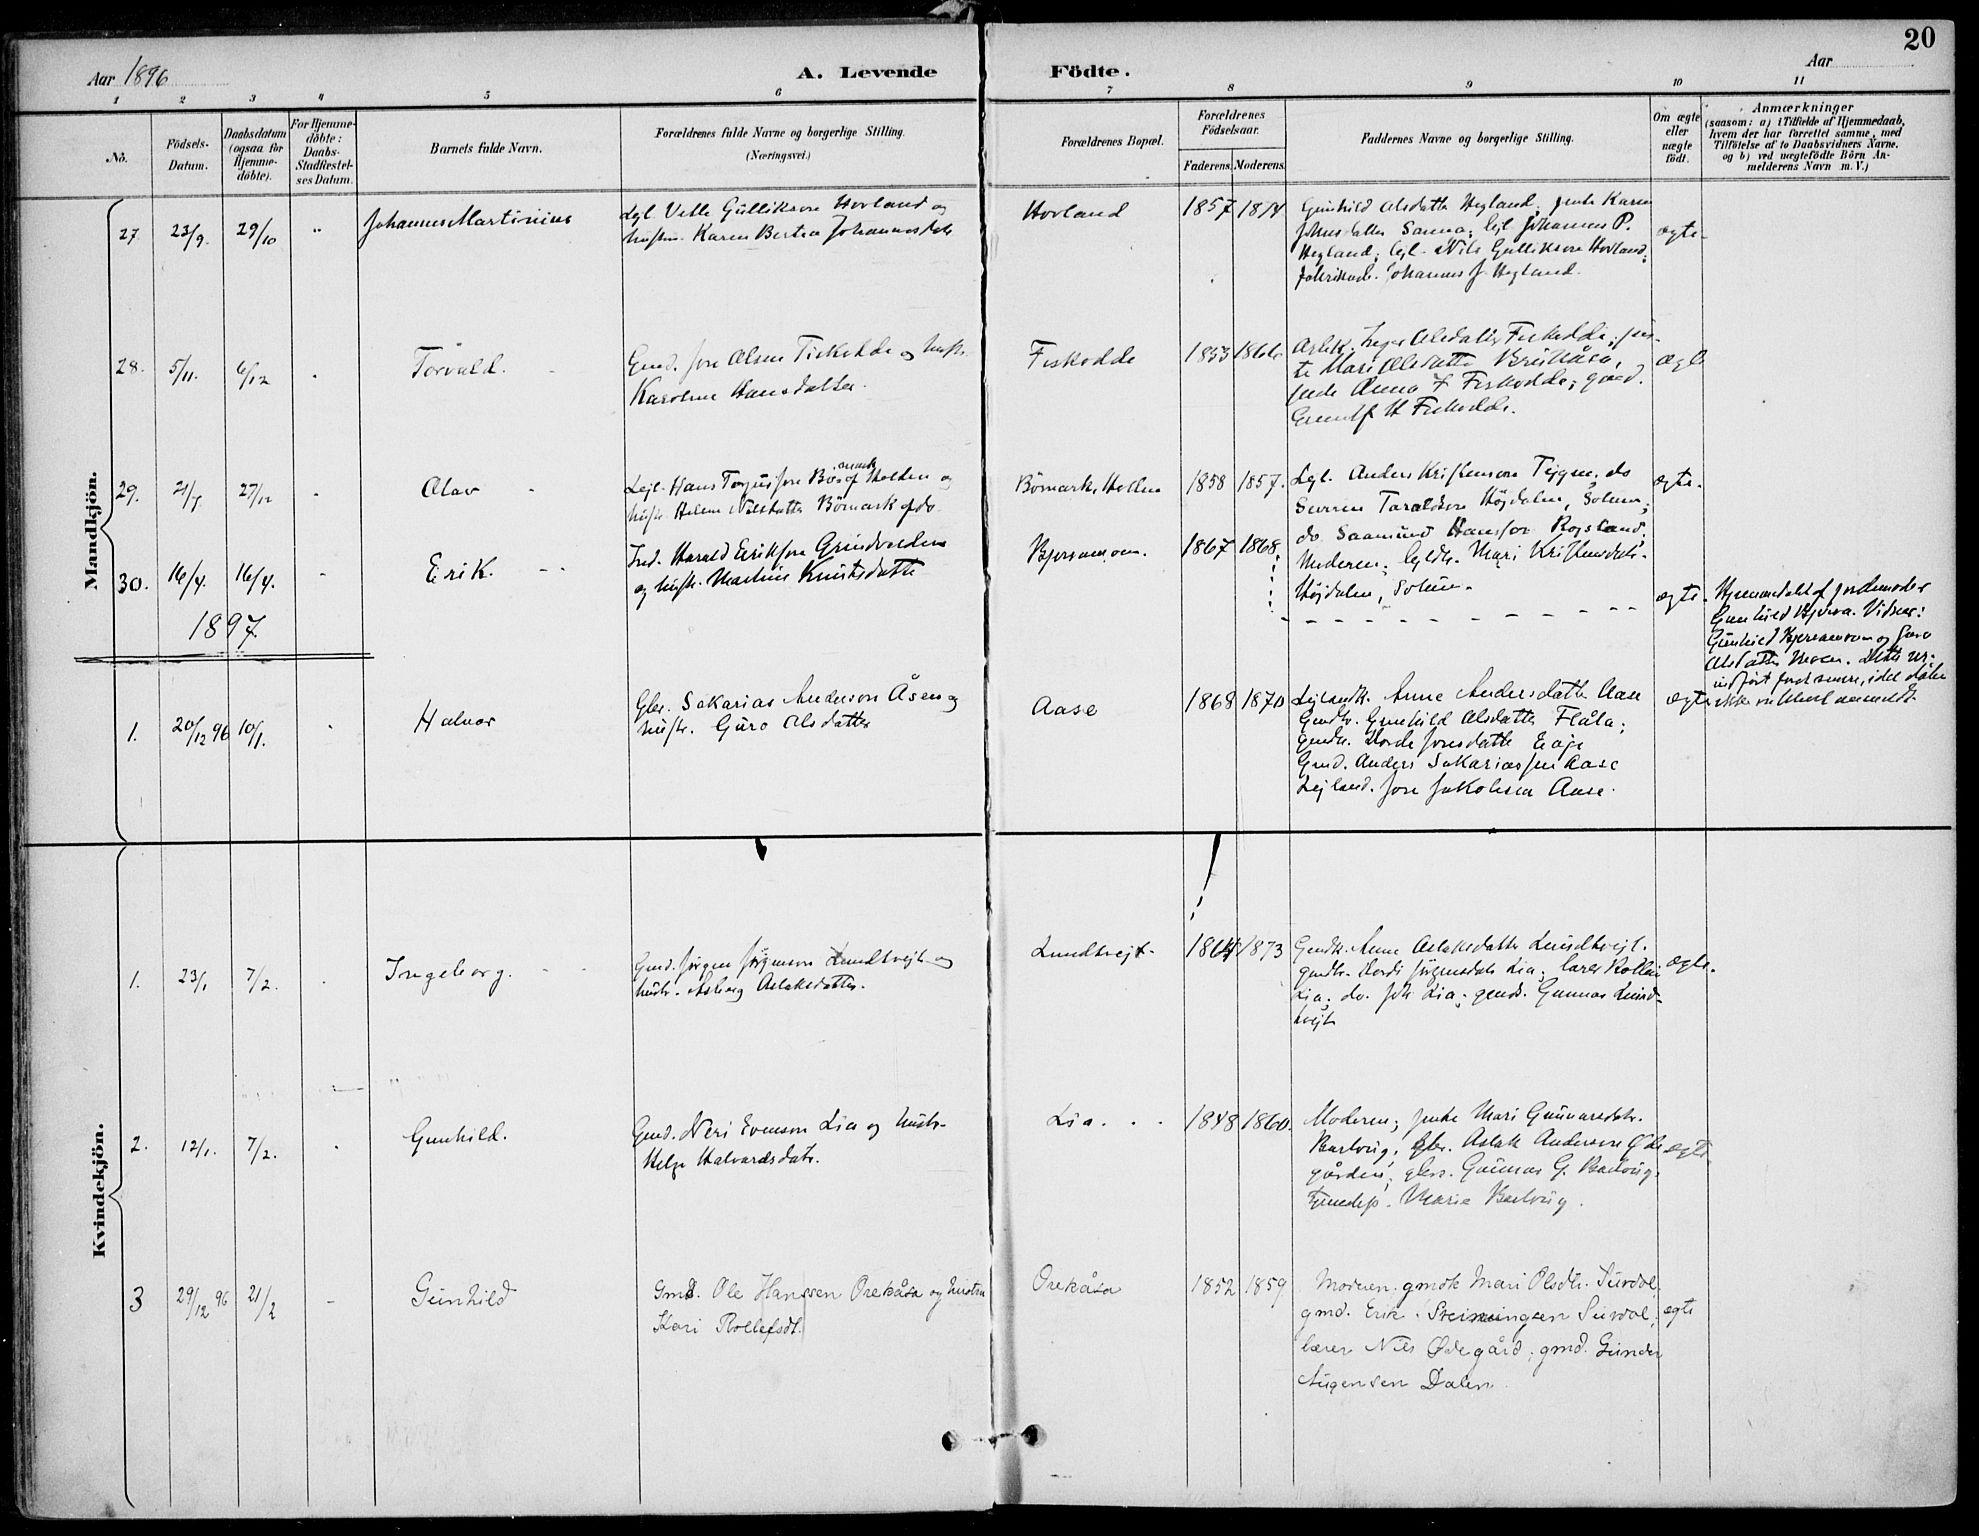 SAKO, Lunde kirkebøker, F/Fa/L0003: Ministerialbok nr. I 3, 1893-1902, s. 20